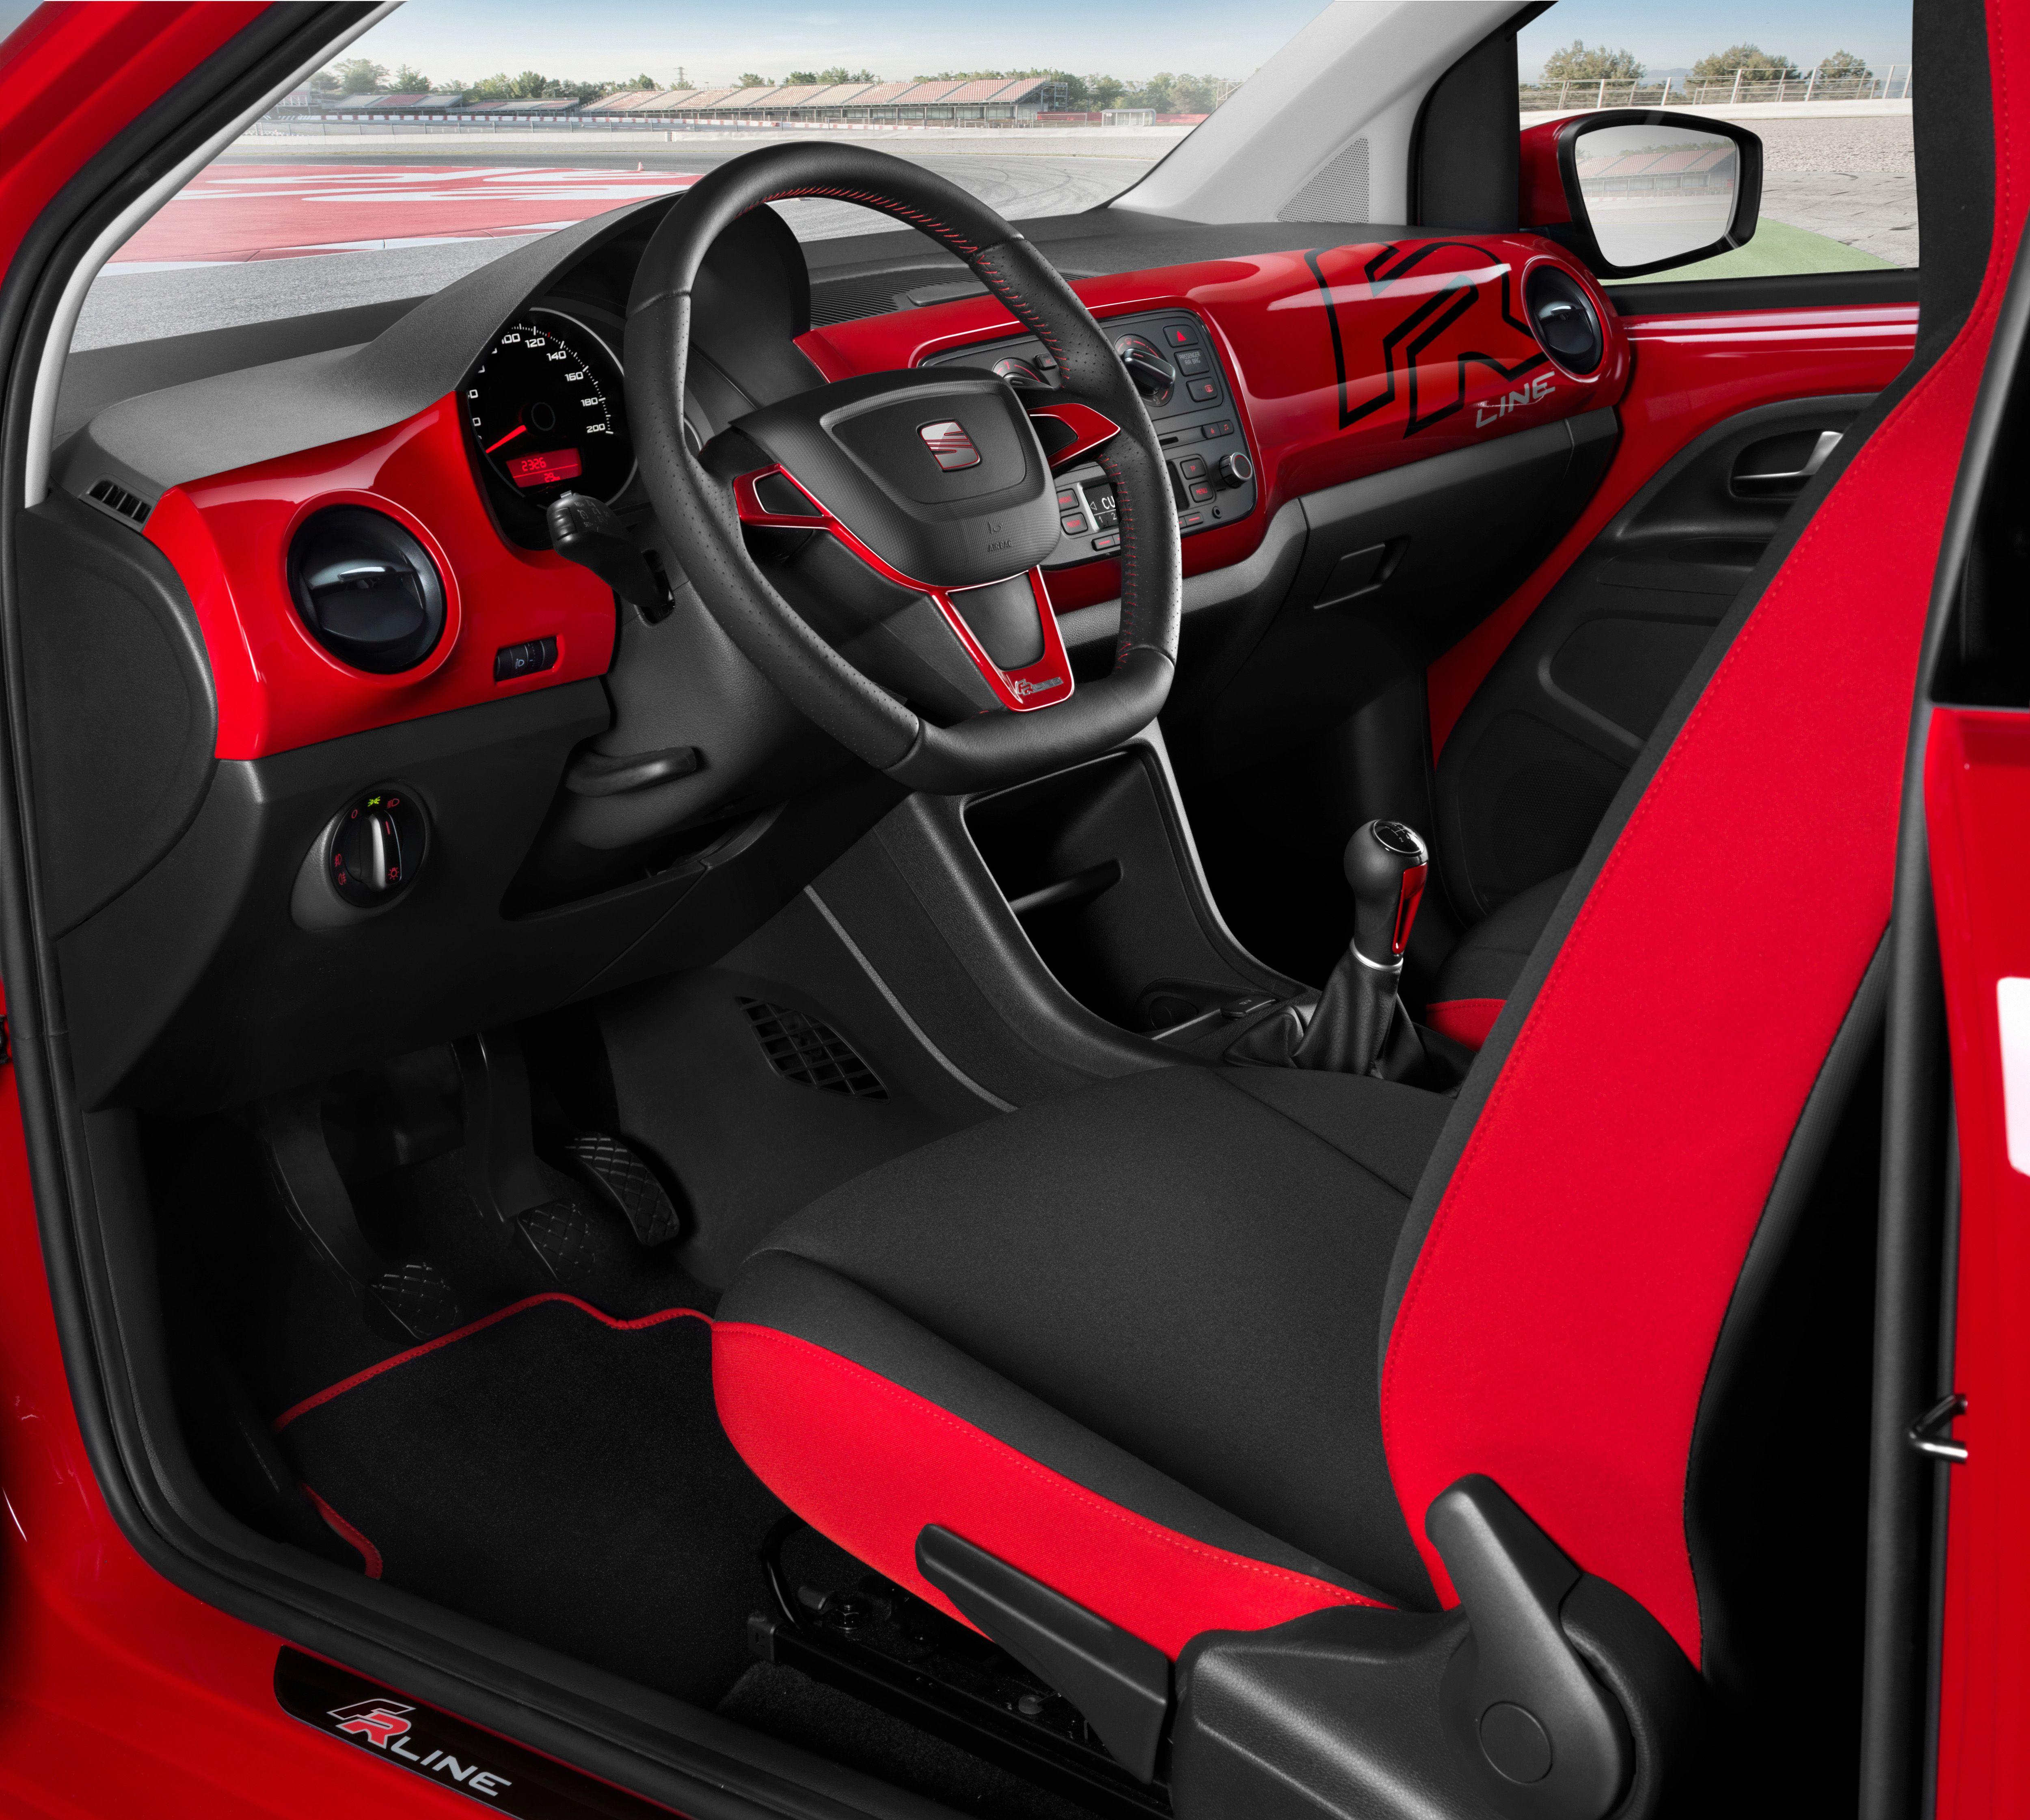 Explore Our Compact Cars Mpvs Suvs Sedans More Seating Car